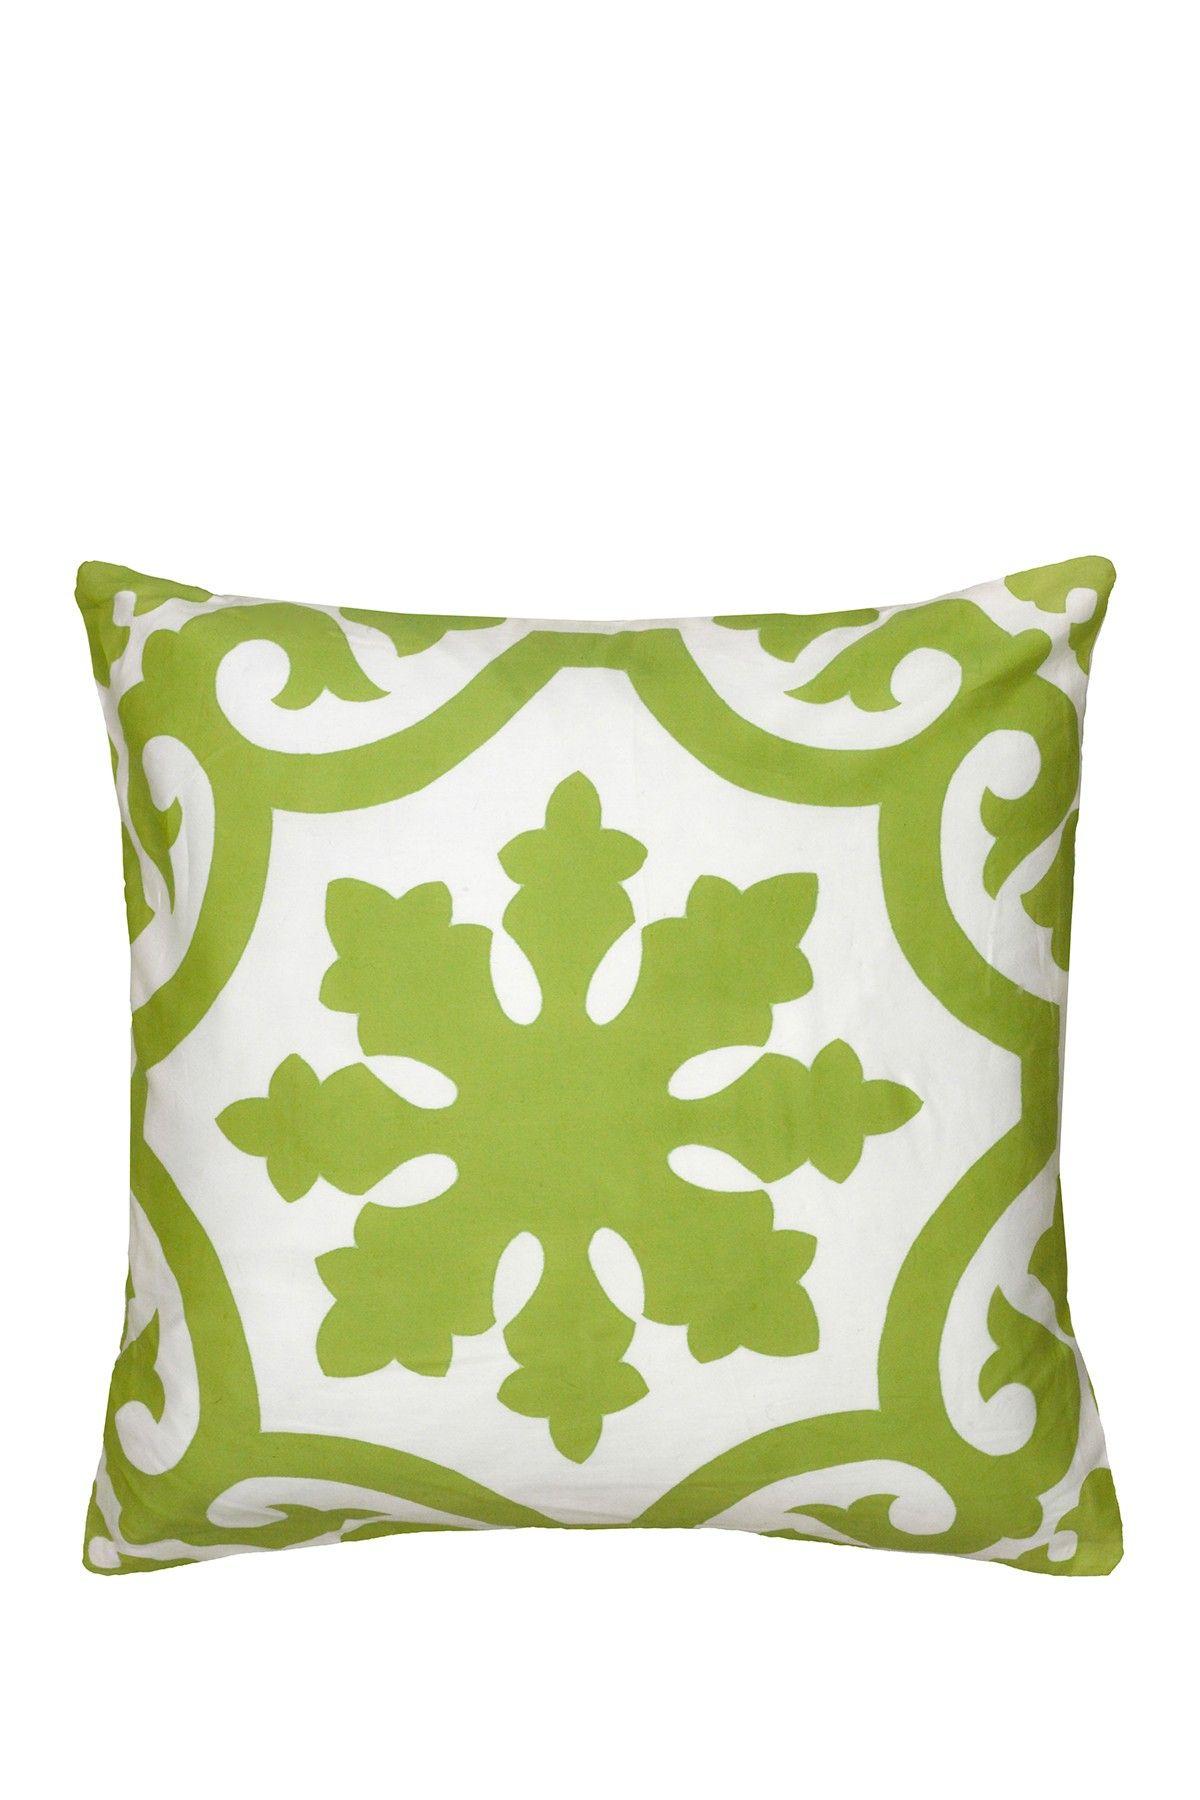 "Decorative Pillow - 18"" x 18"" - Lime"